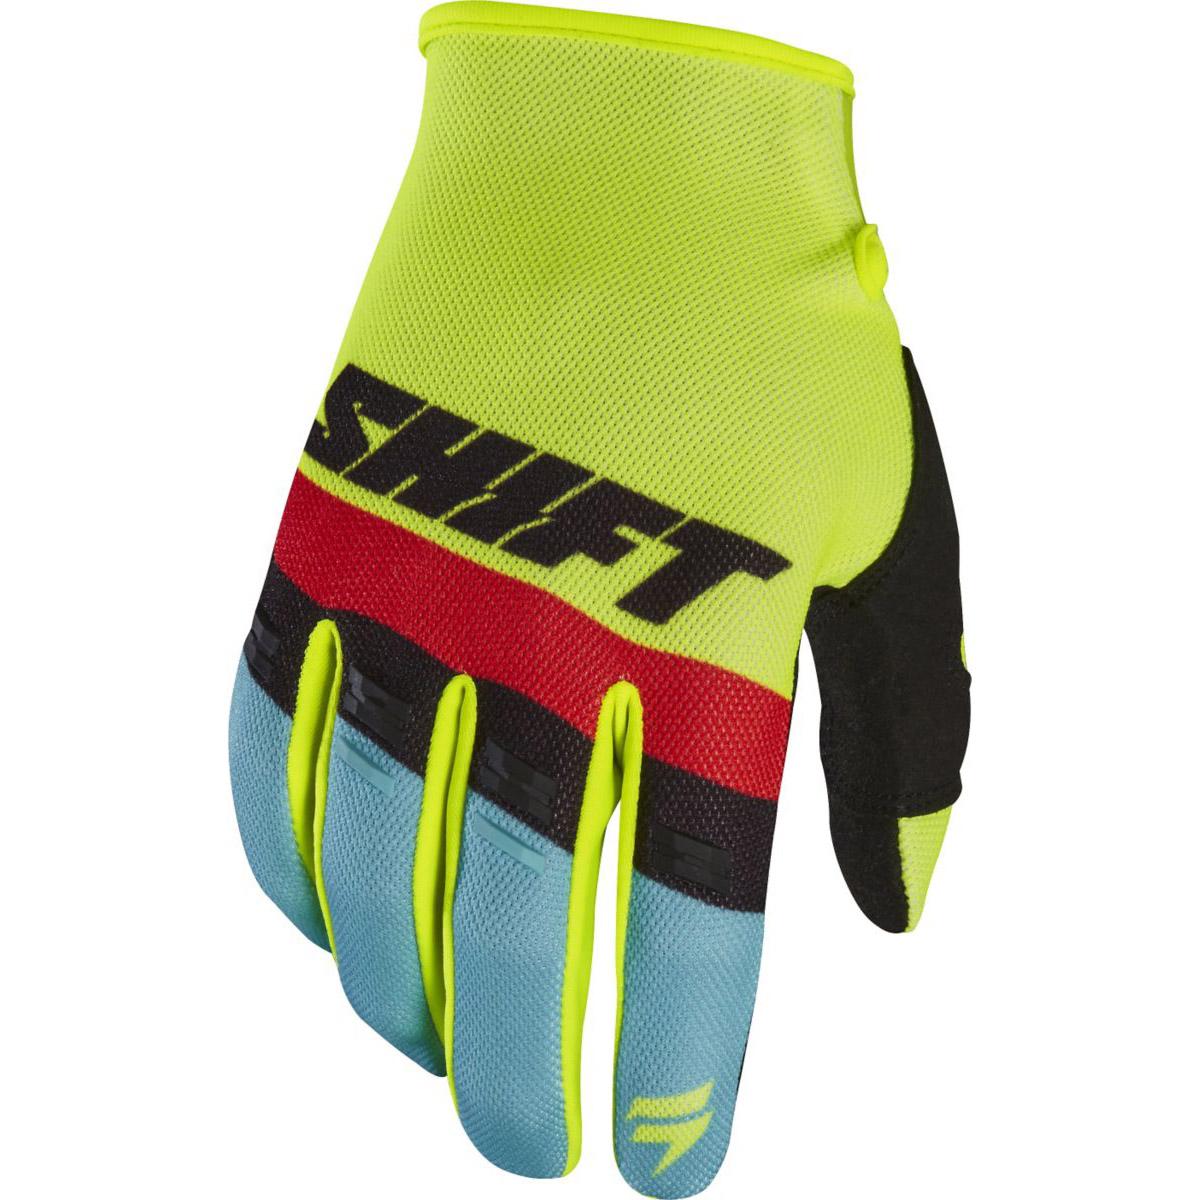 Shift - 2017 White Label Air перчатки, желтые